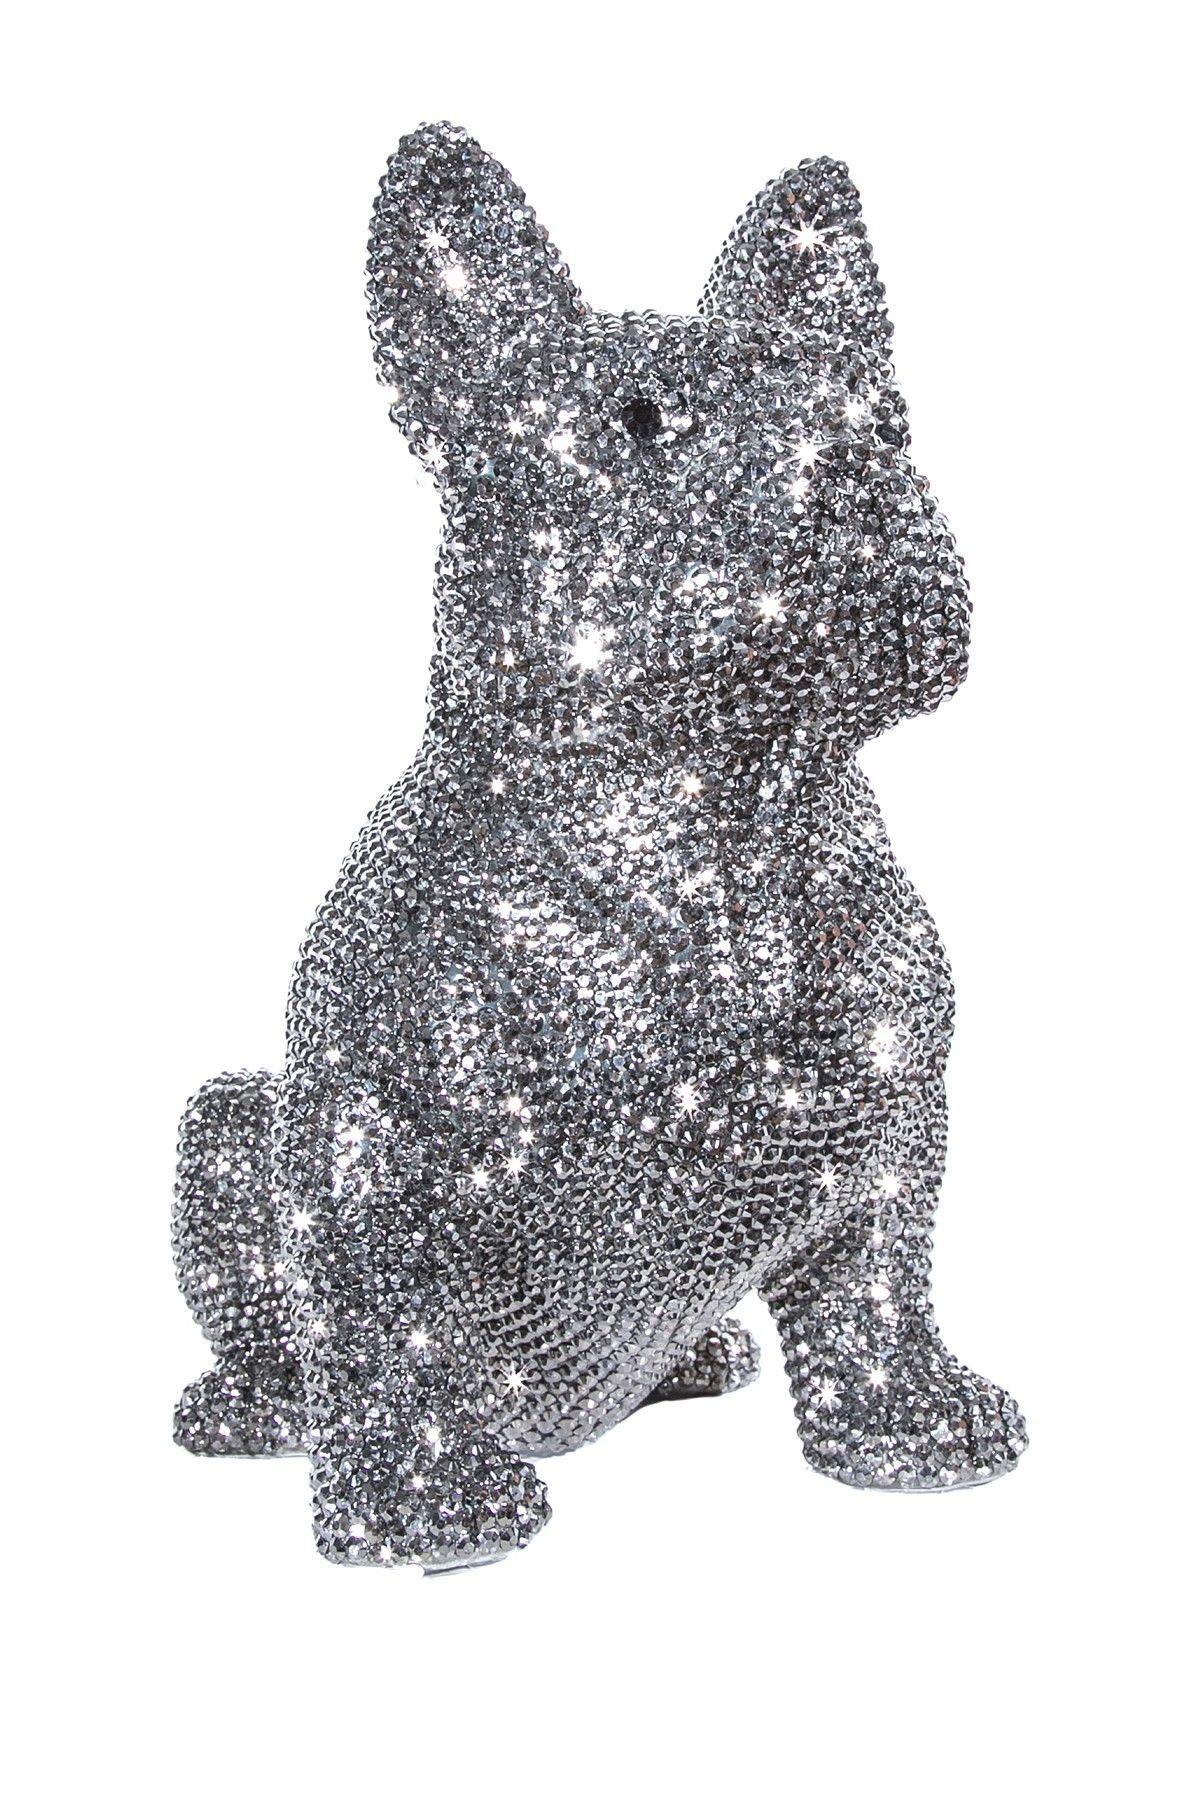 Obsessed With This Rhinestone French Bulldog Bank French Bulldog